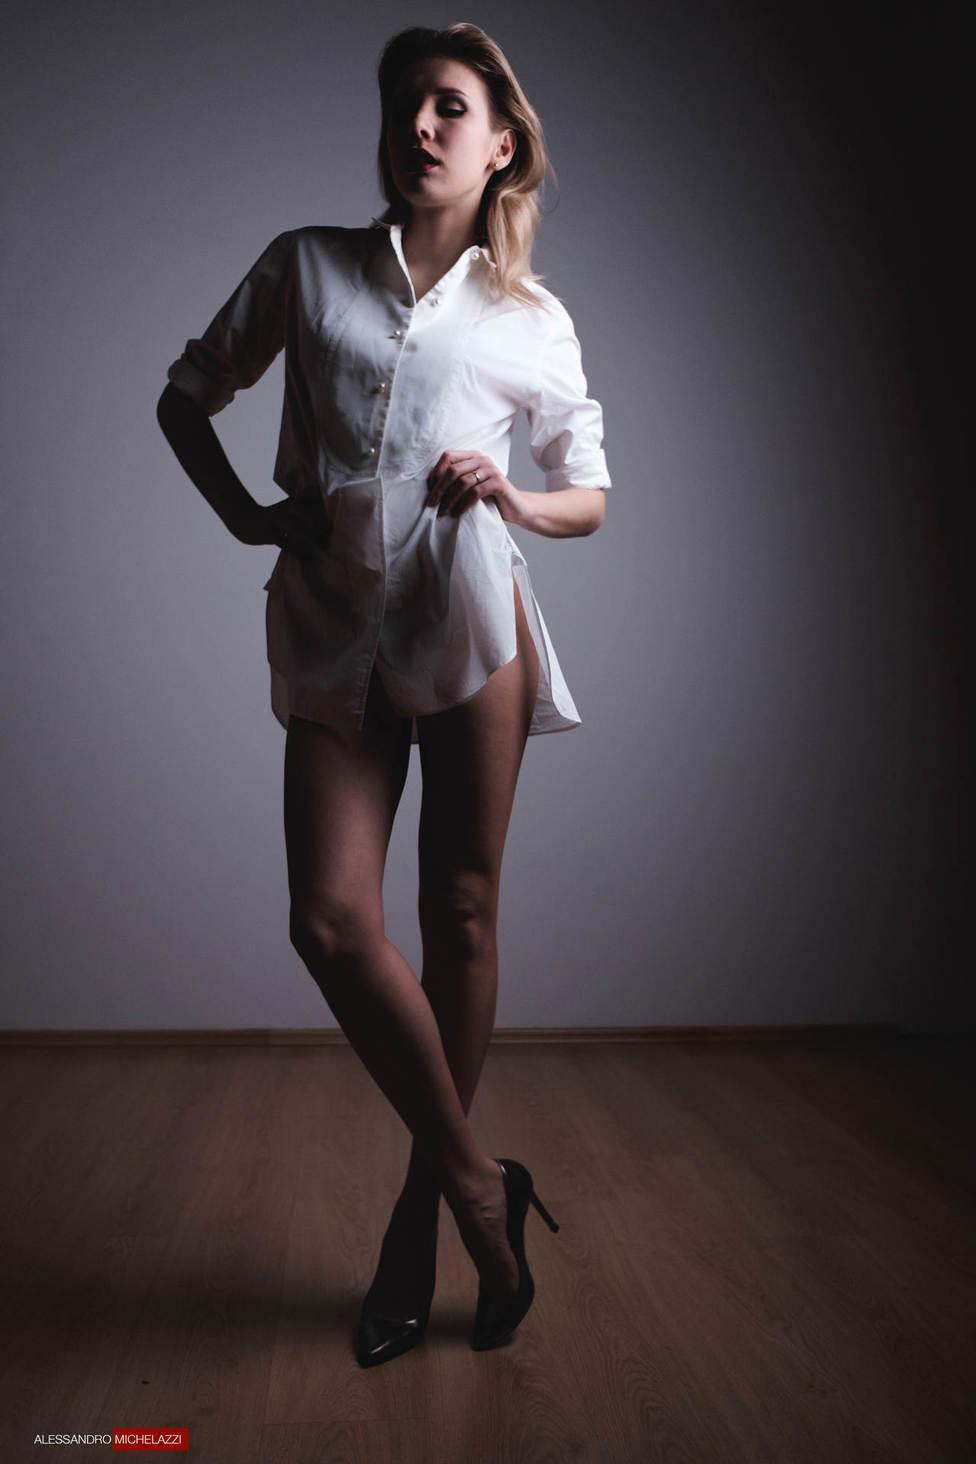 Alessandro-Michelazzi-Photography-X70-Fashion-Test-11